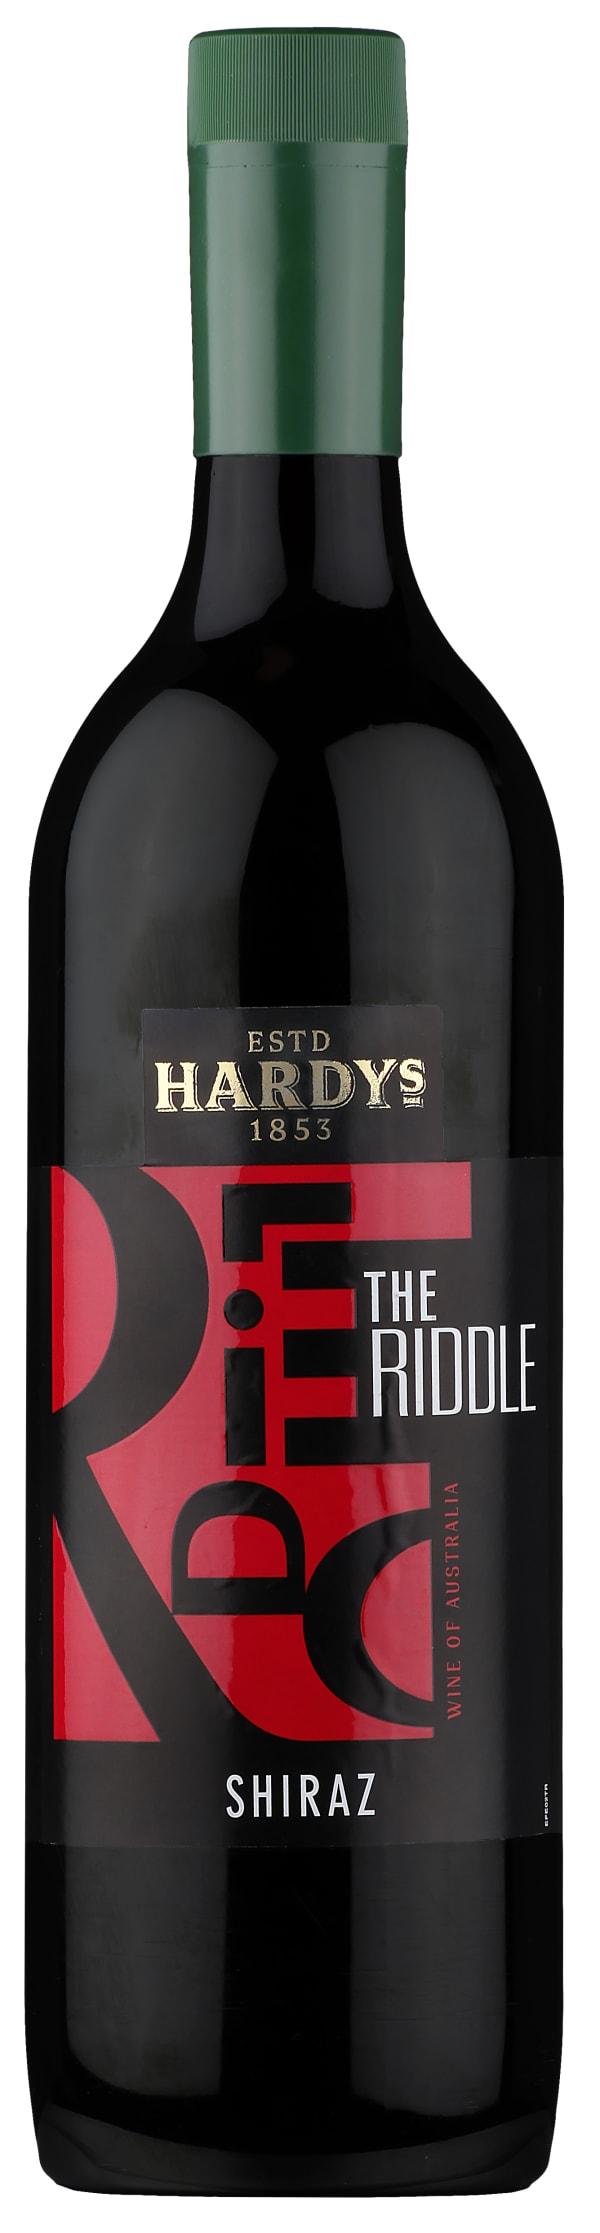 Hardys The Riddle Shiraz 2016 plastflaska